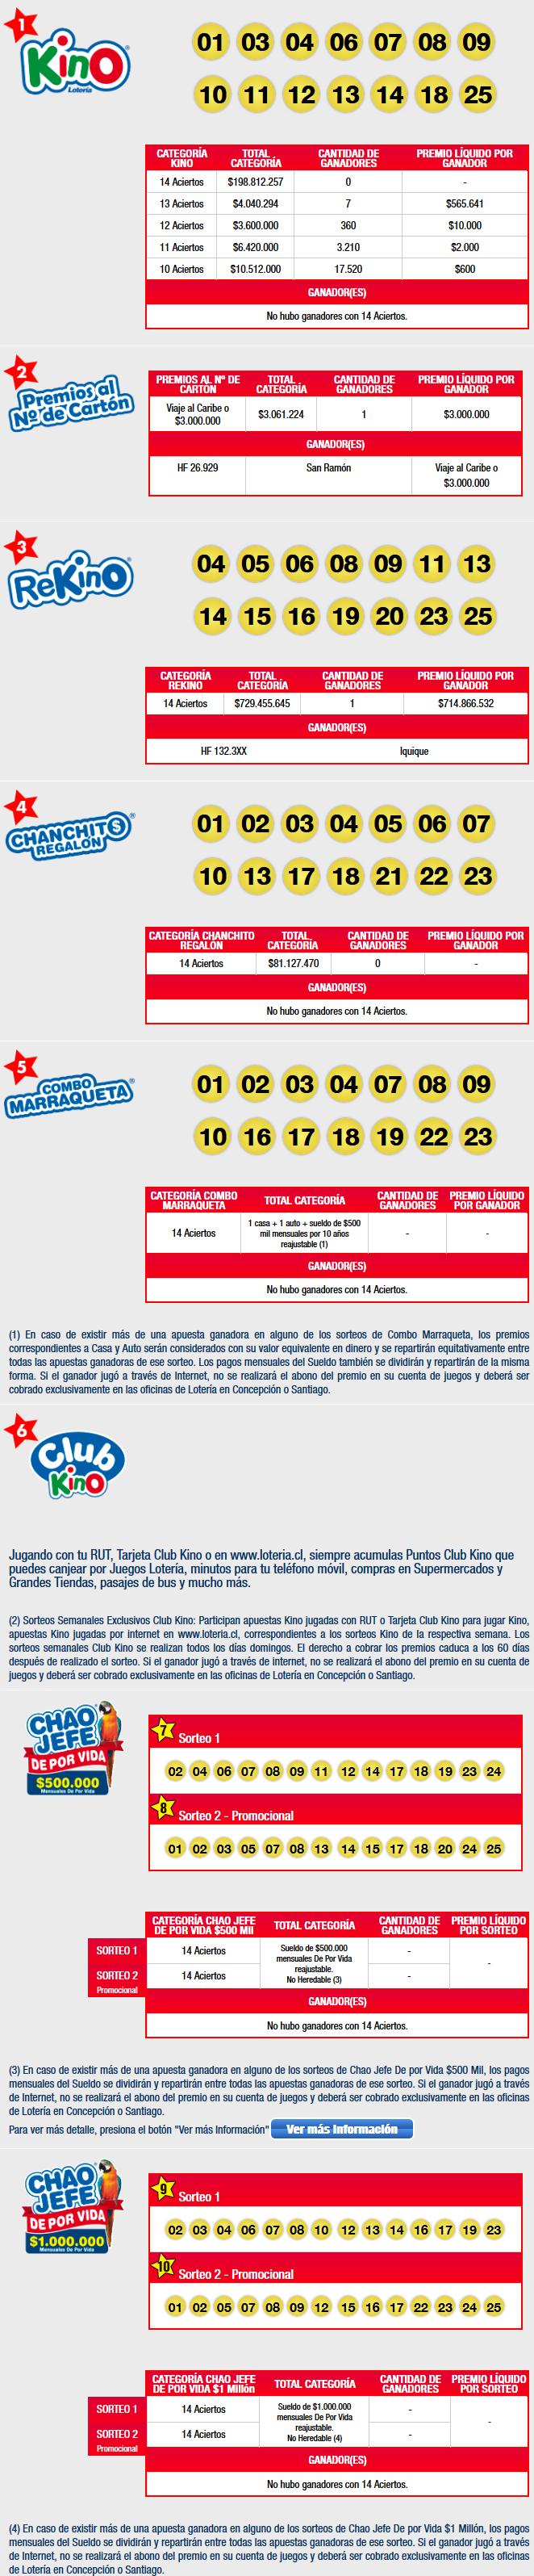 Kino Miercoles 20 2019 Sorteo 2158